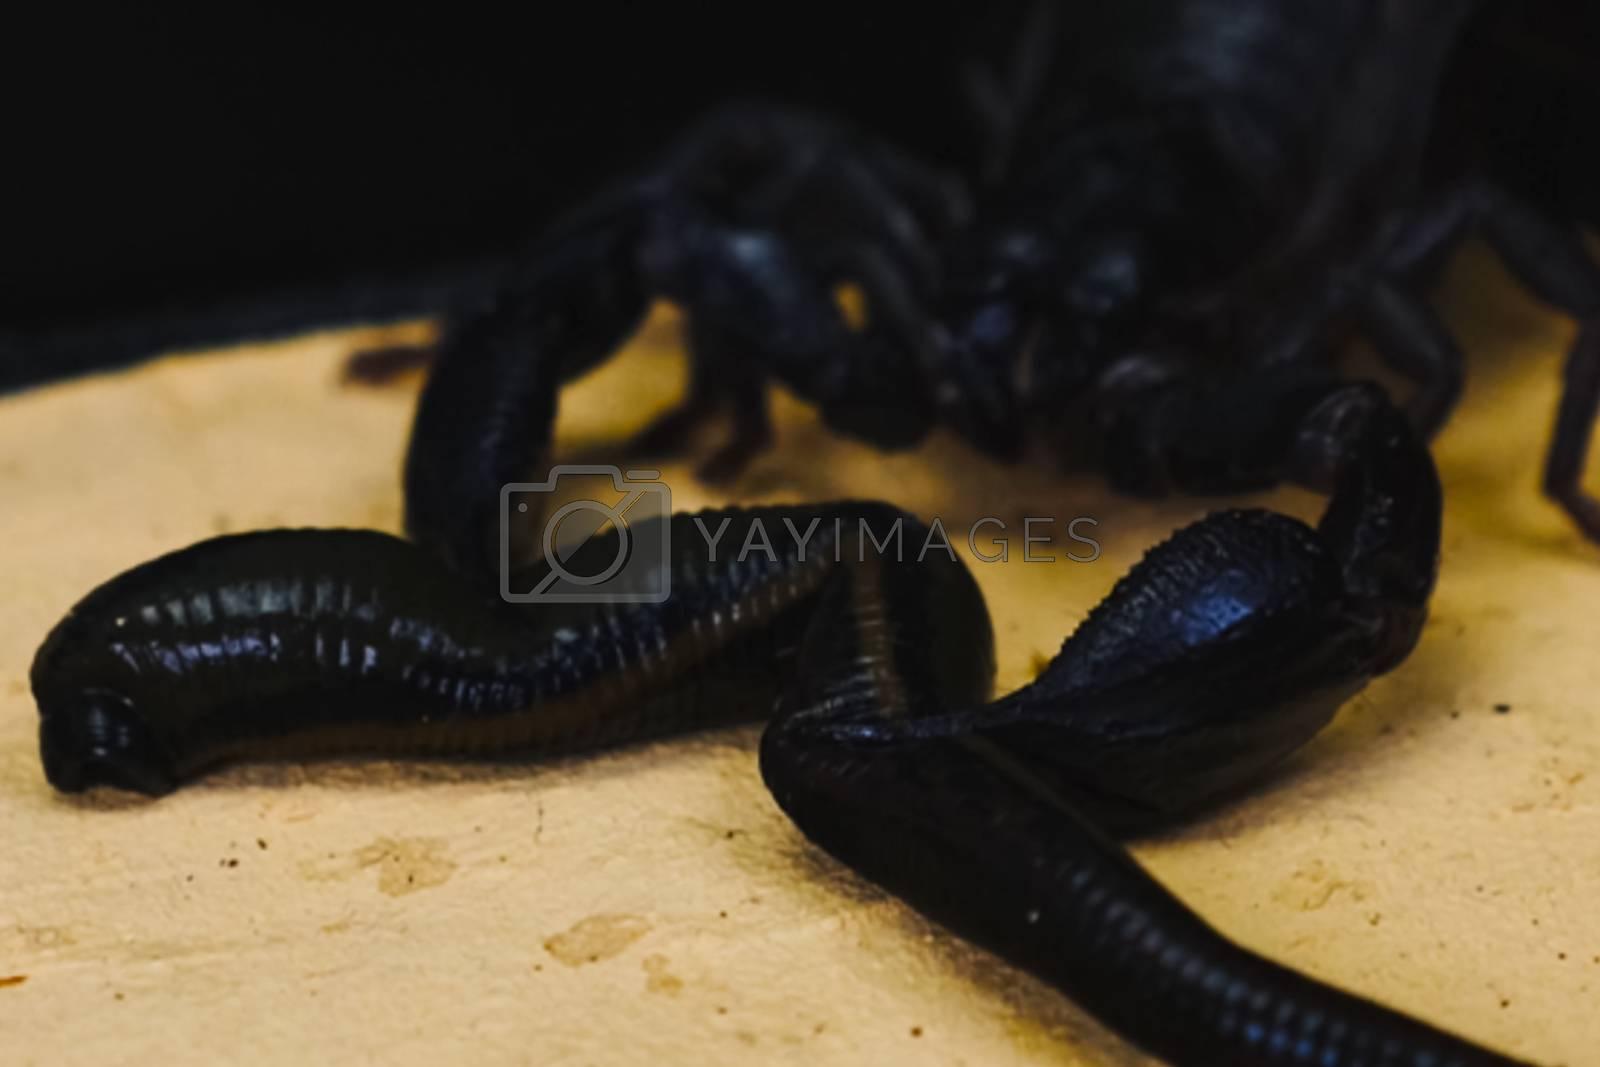 Scorpion with a leech in the terrarium. Black scorpion is a poisonous arthropod and bloodsucking leech.